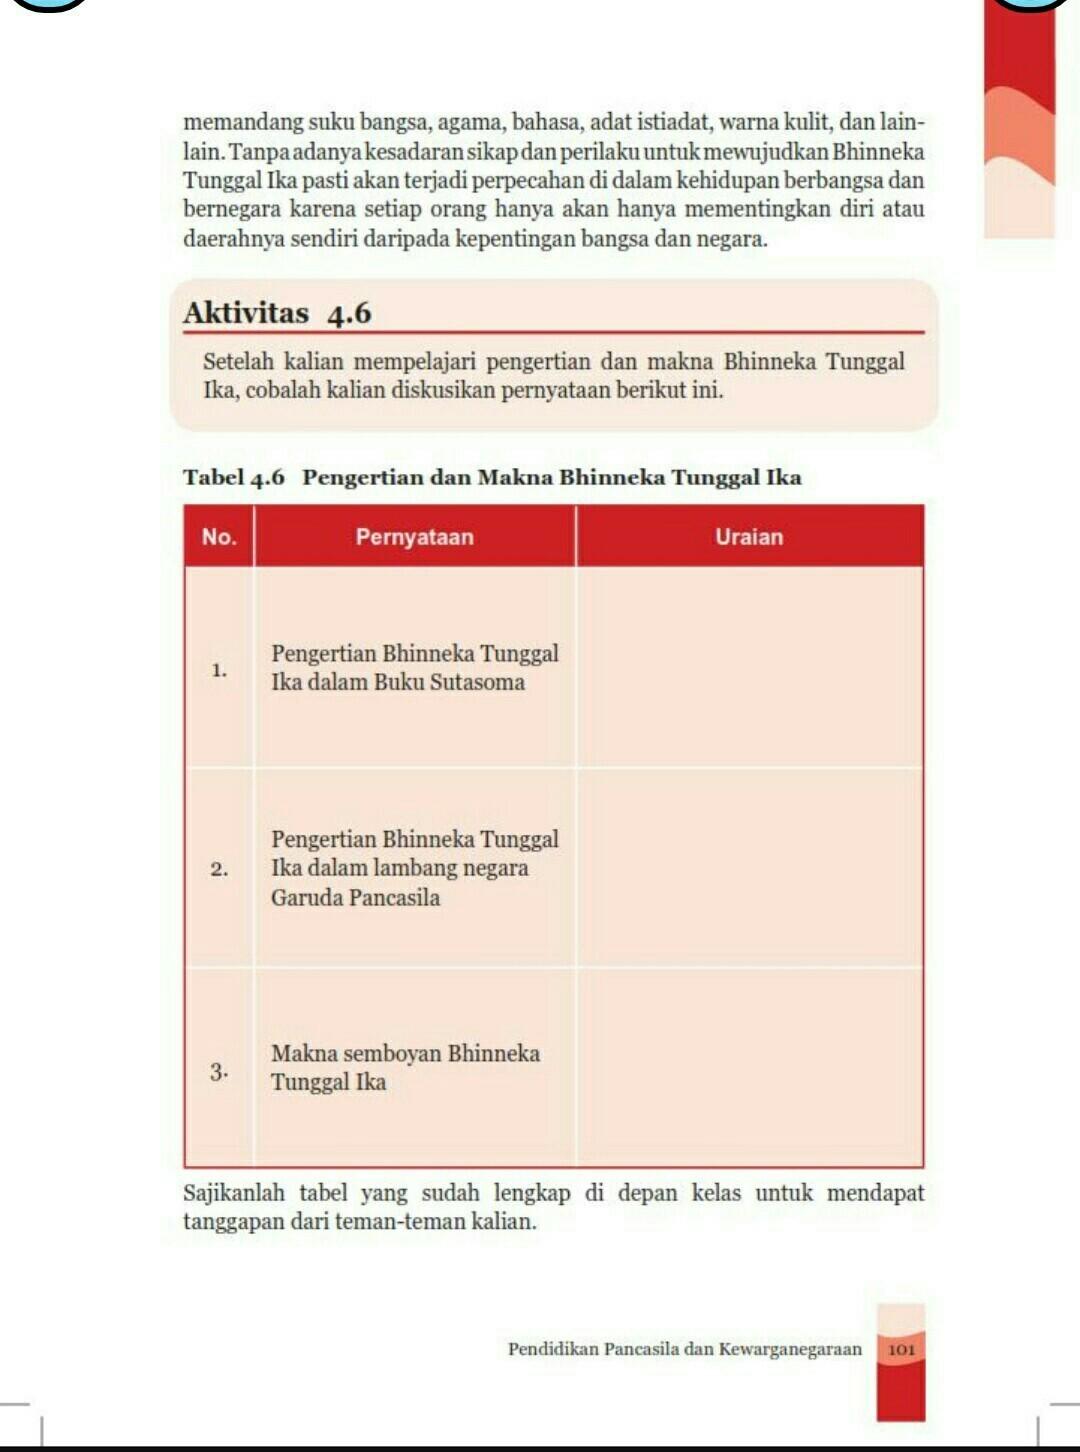 Pengertian Bhineka Tunggal Ika Dalam Buku Sutasoma : pengertian, bhineka, tunggal, dalam, sutasoma, Tabel, Kelas, Brainly.co.id